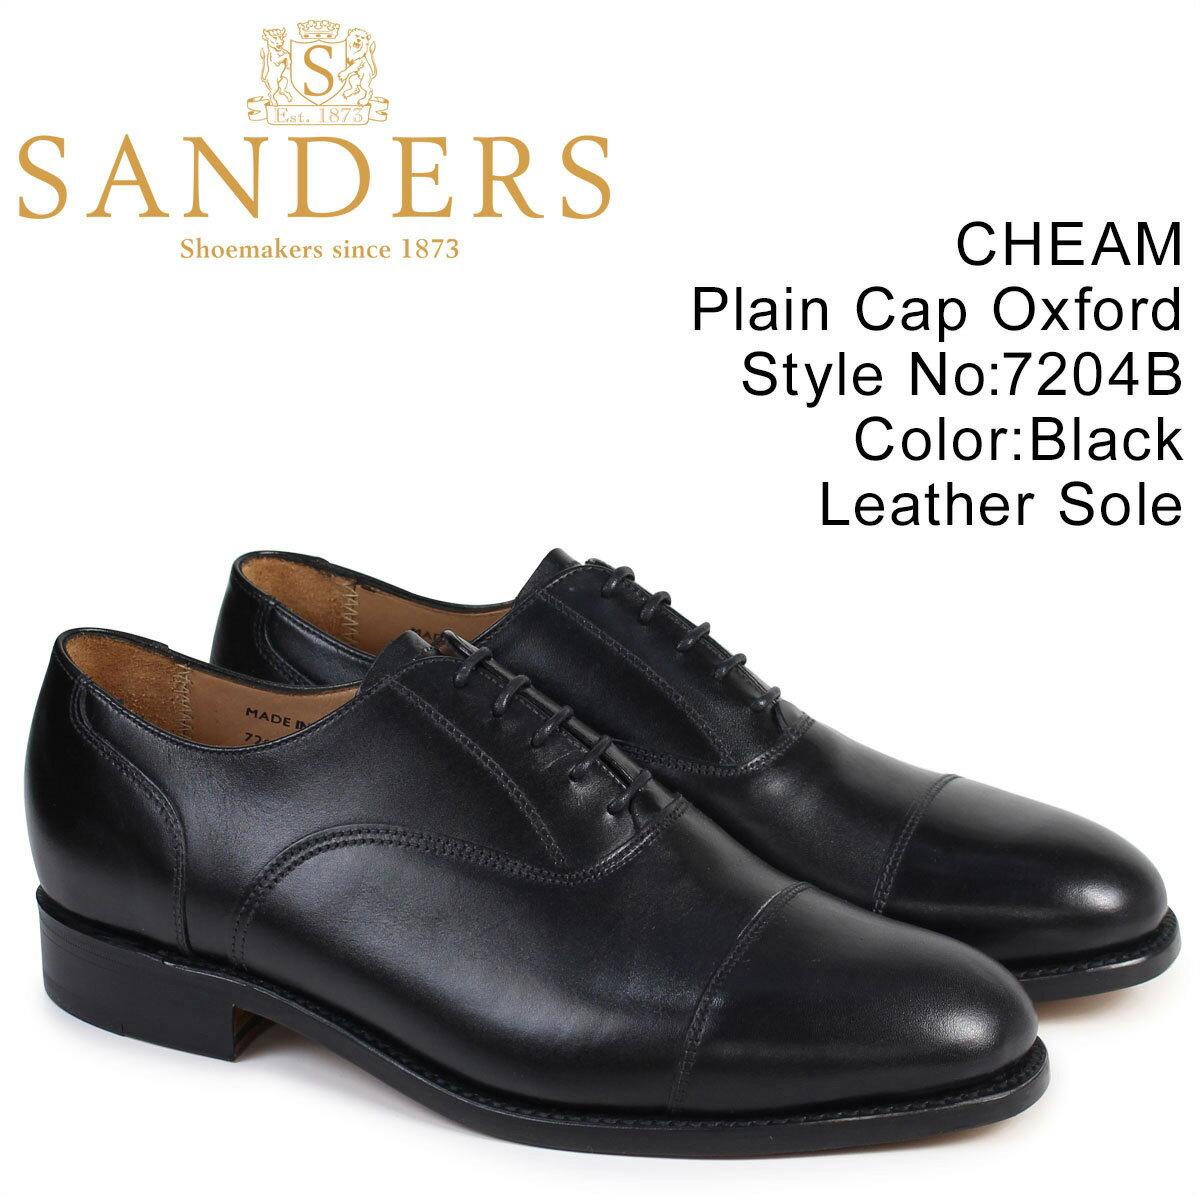 SANDERSサンダース 靴 ミリタリー オックスフォード シューズ ビジネス CHEAM 7204B メンズ ブラック